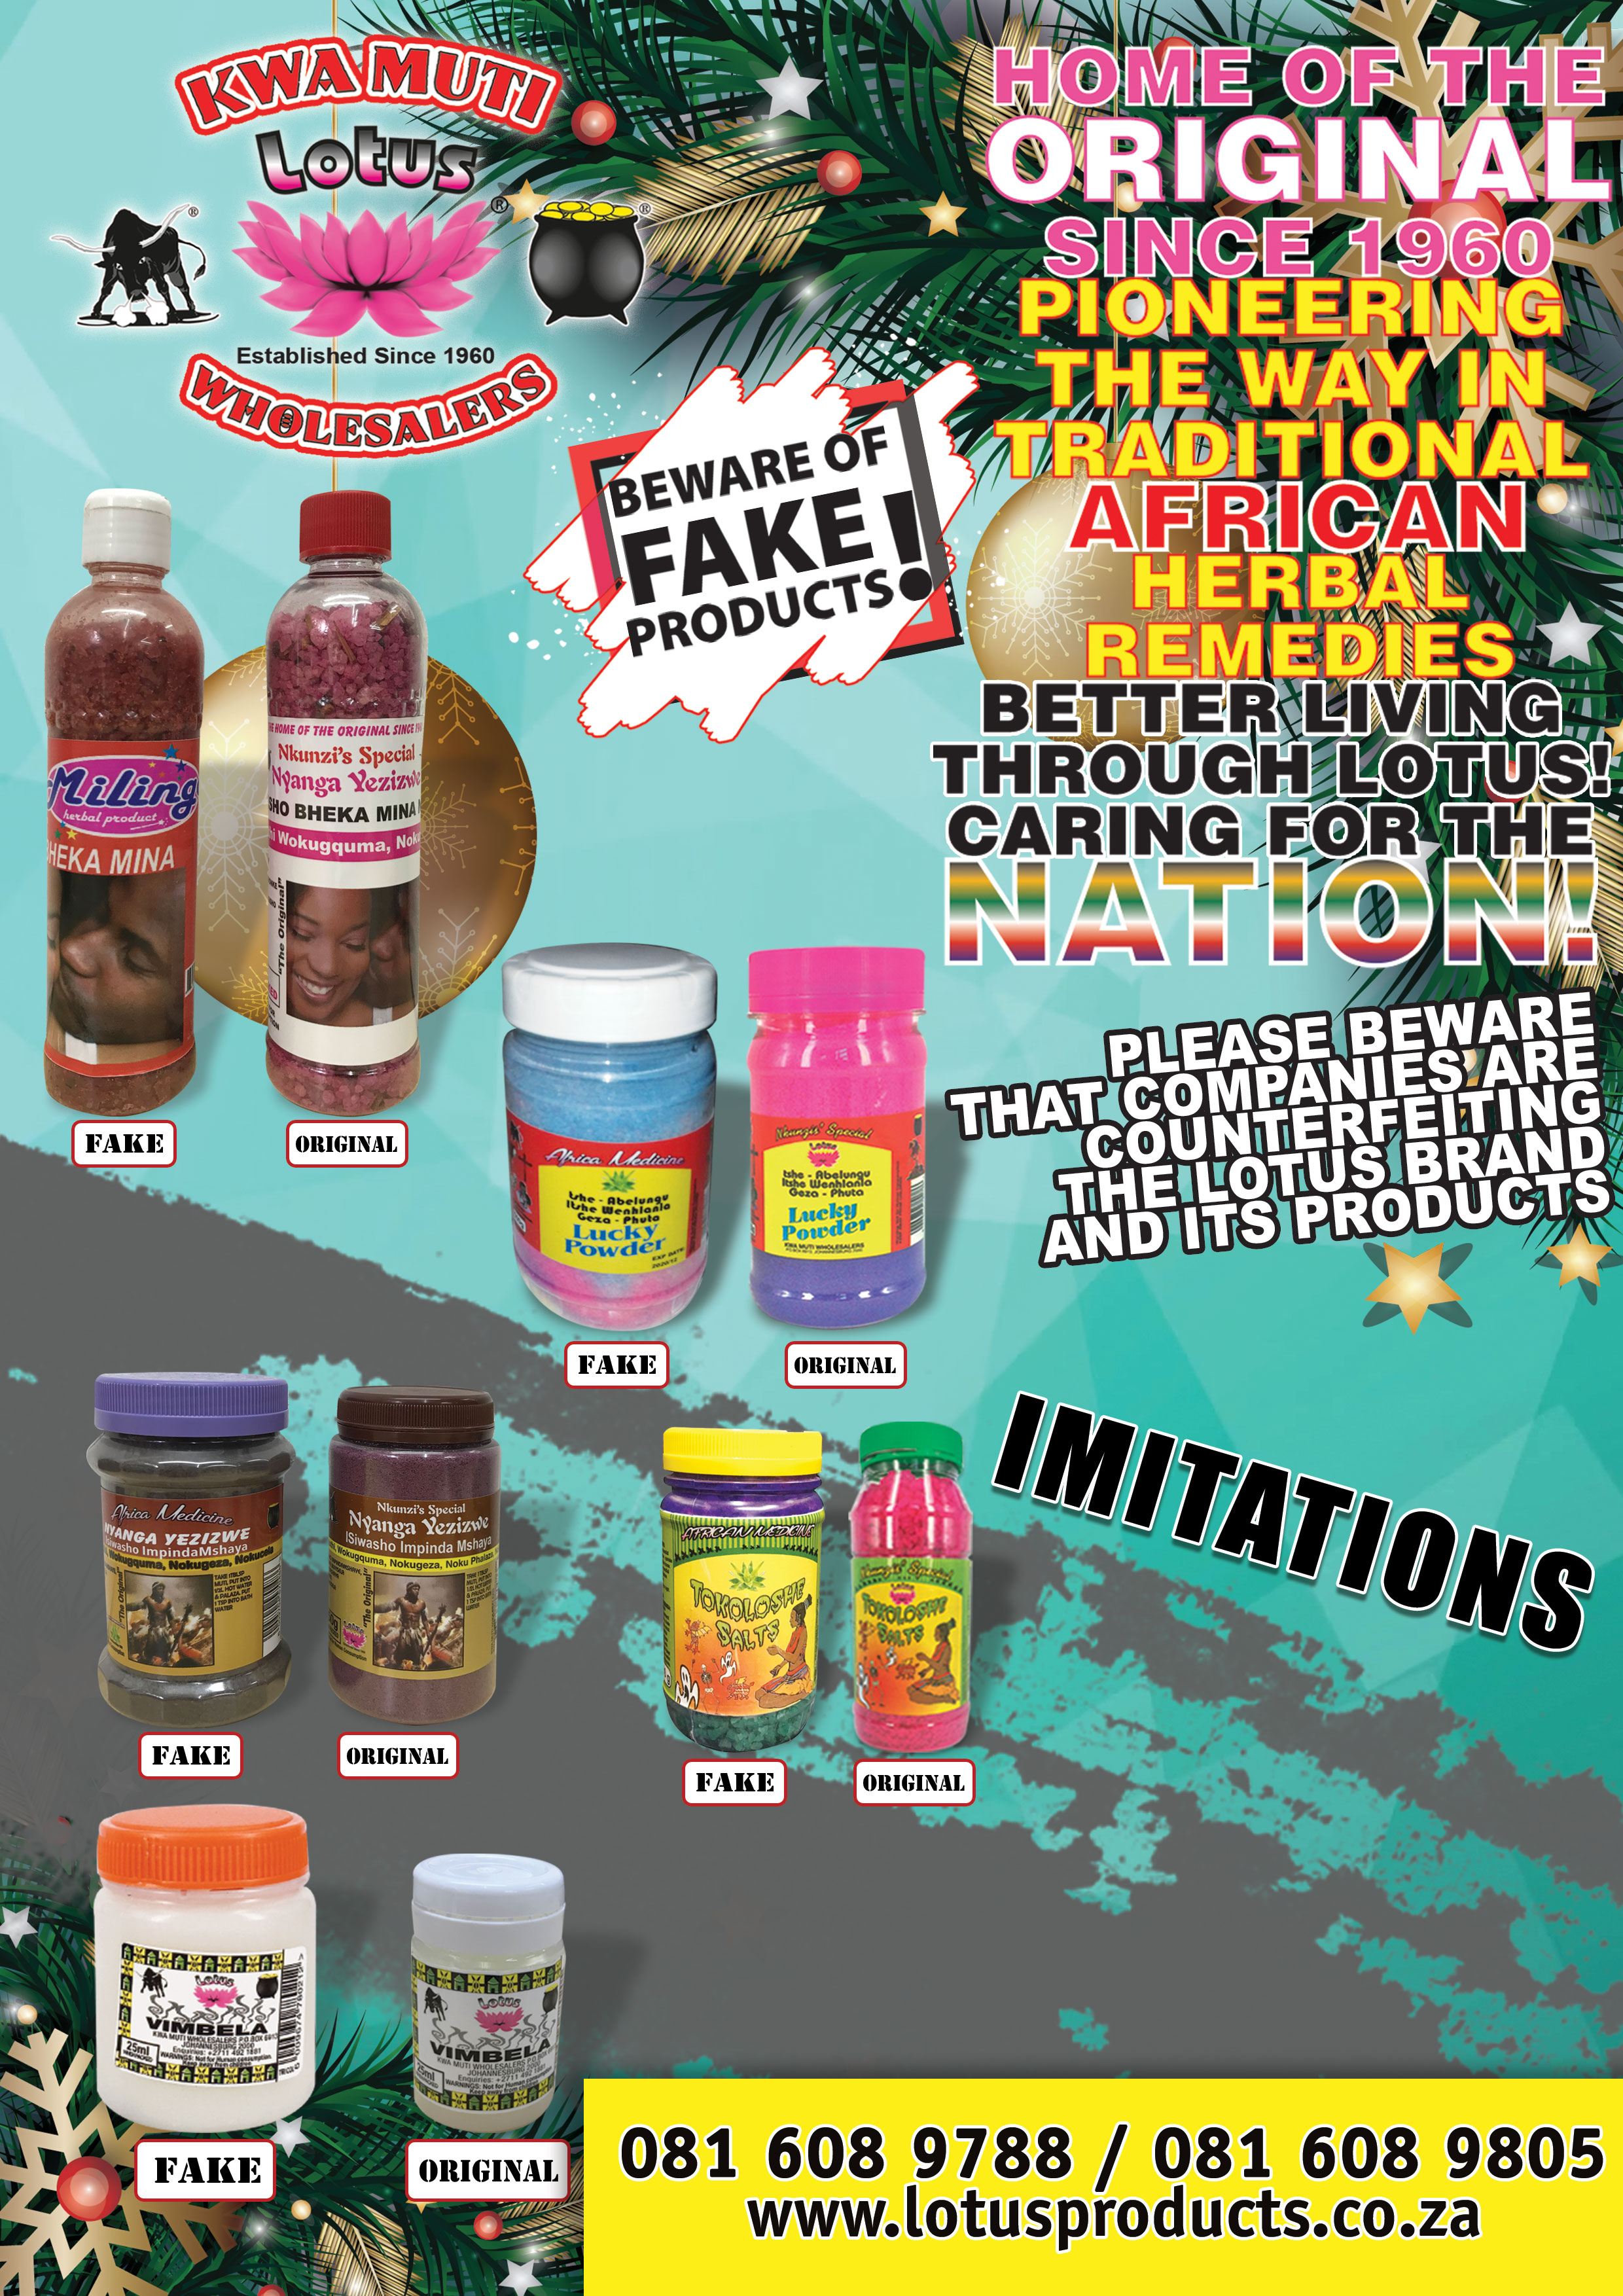 Kwa Muti Wholesalers in South Africa, Kwa Muti Manufactures